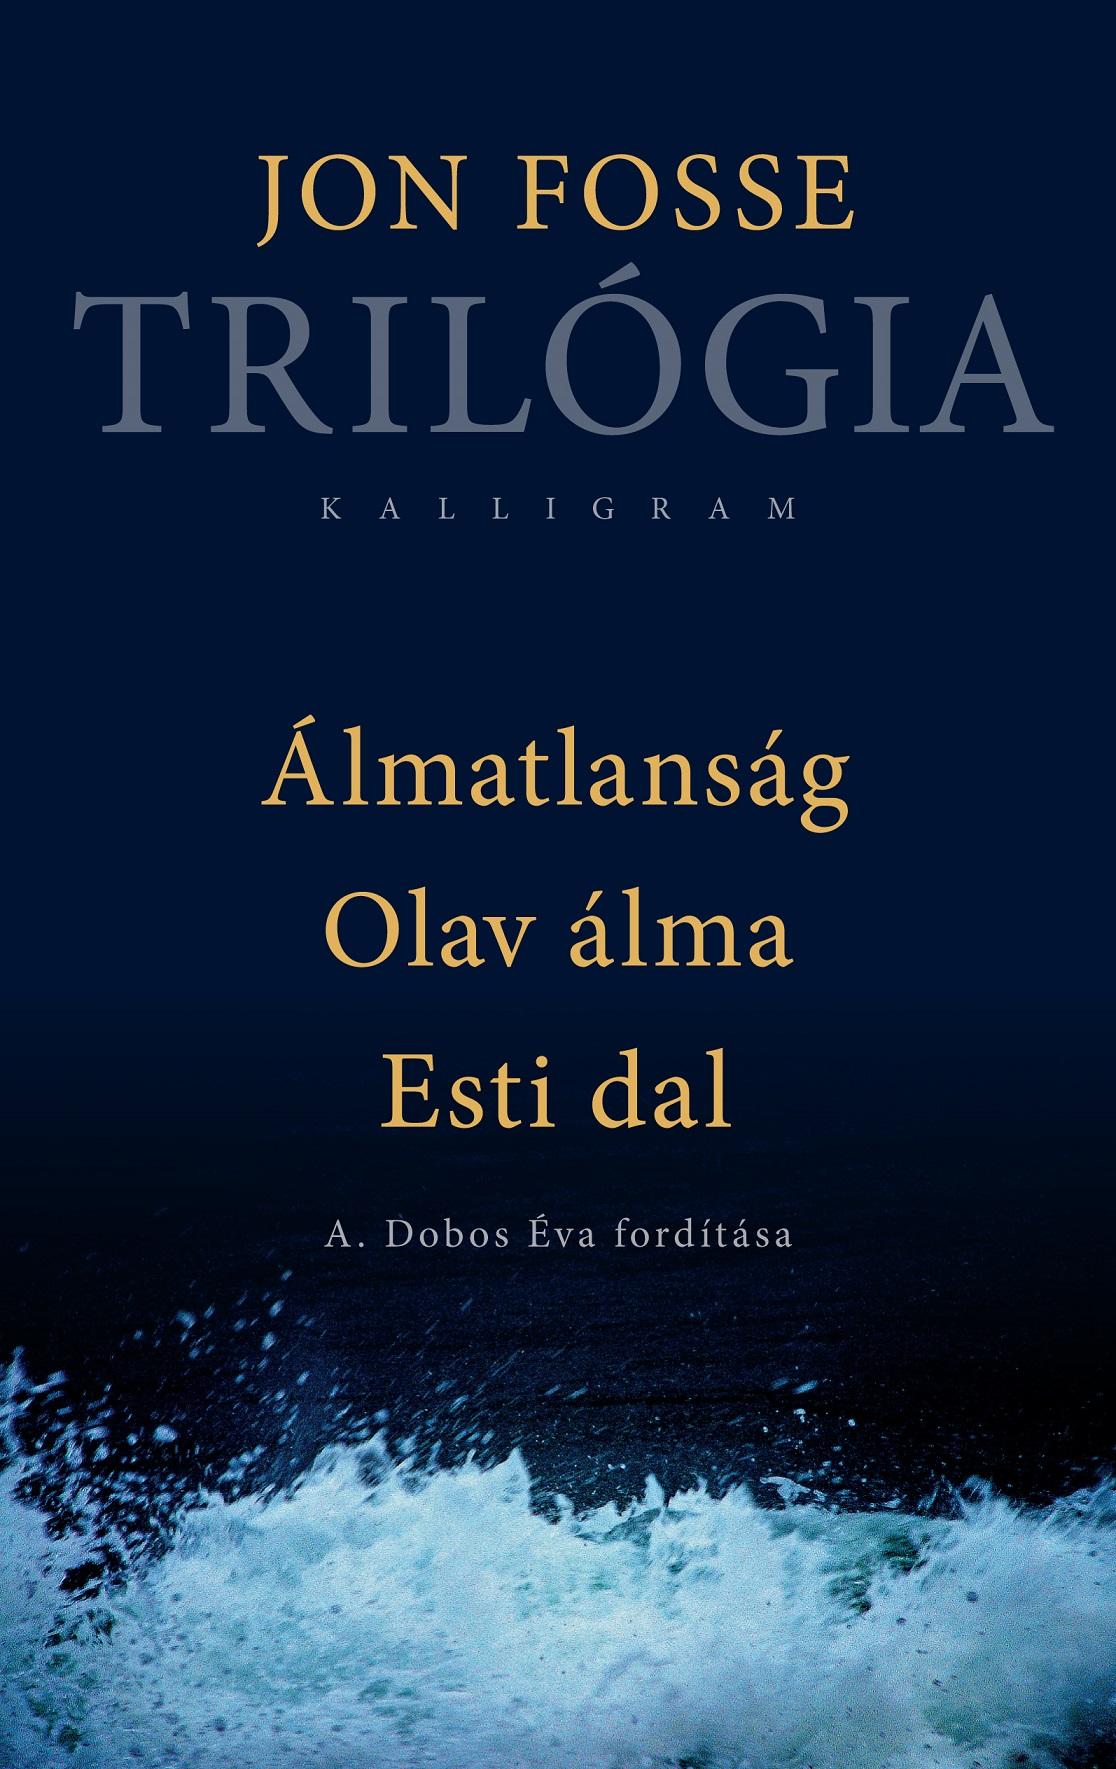 $-FOSSE-J_Trilogia_COVER.indd